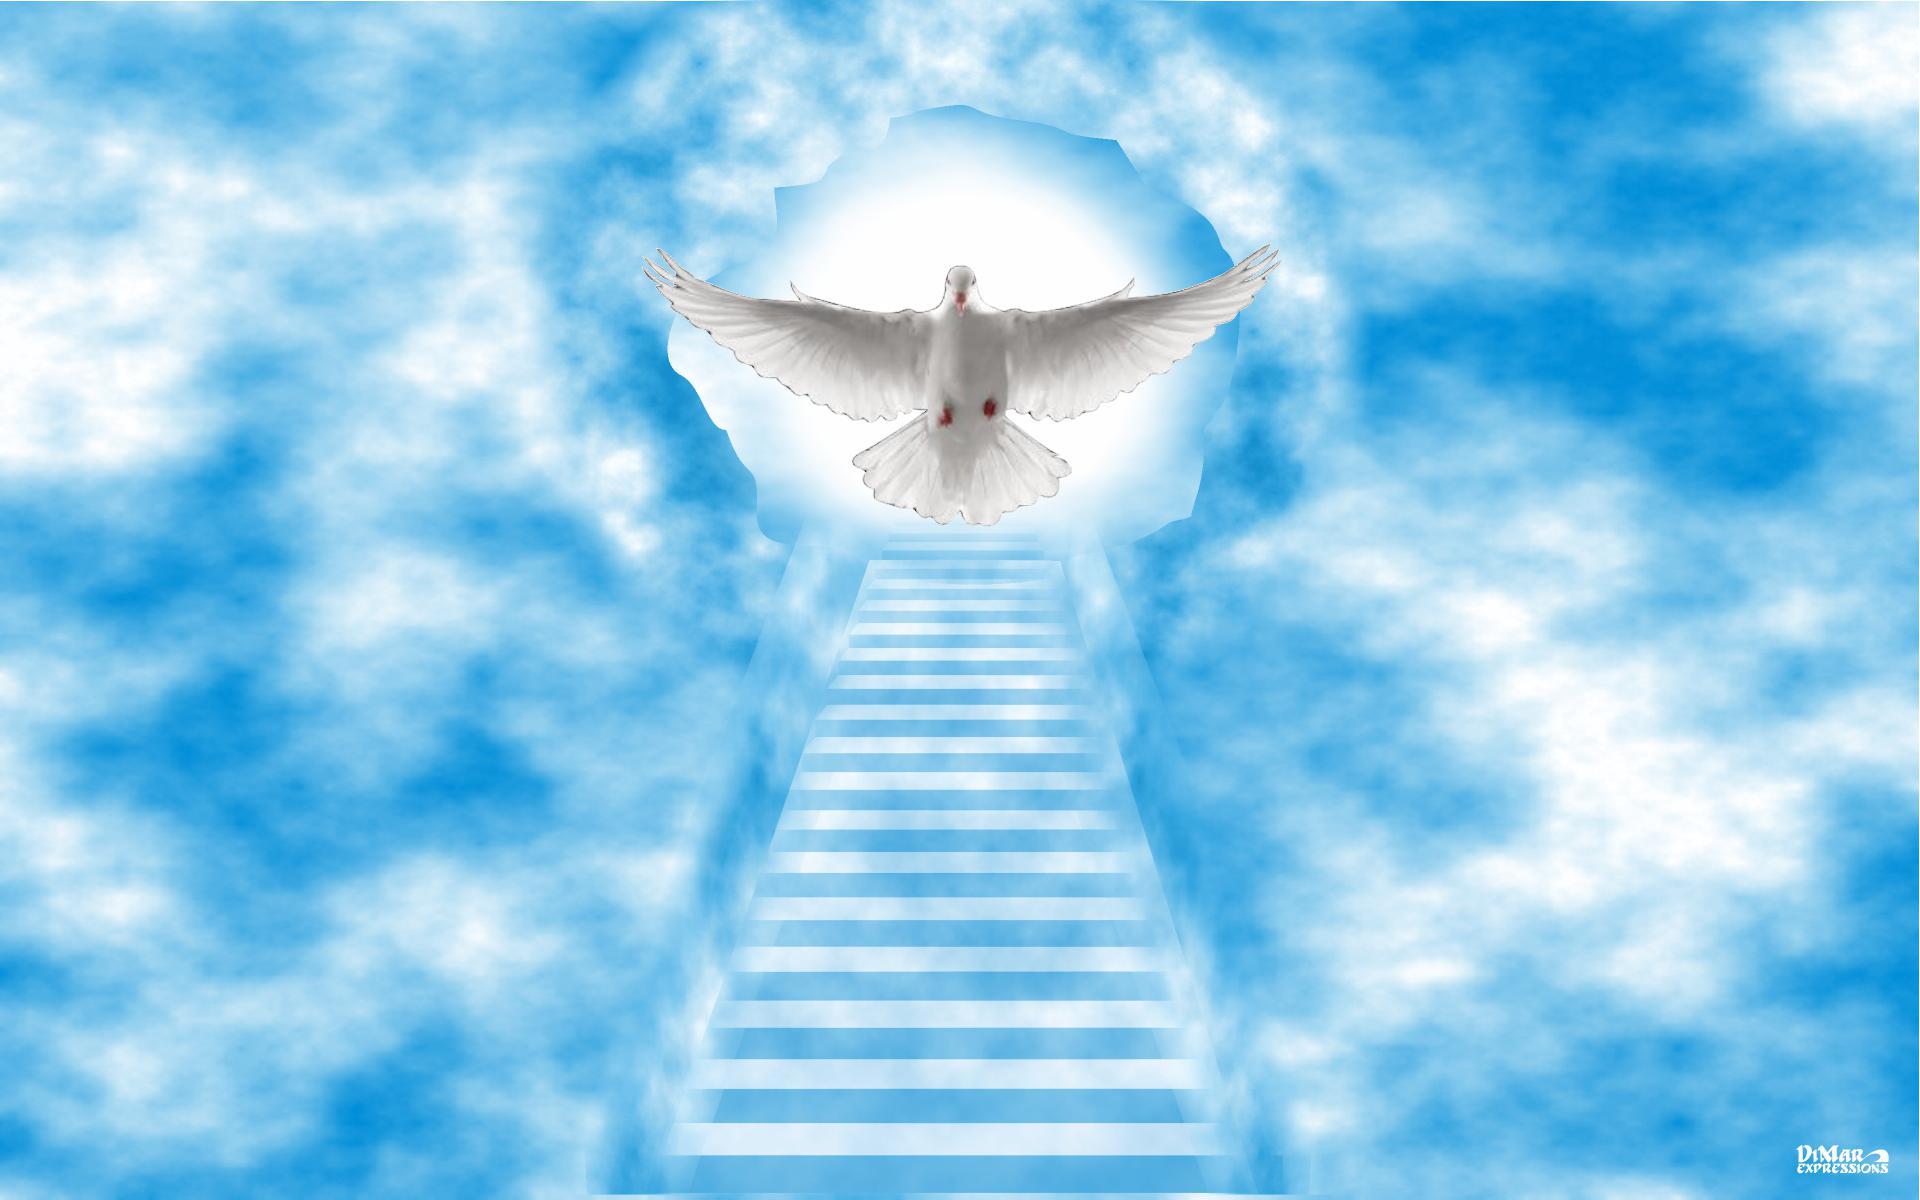 Heaven Images Backgrounds - WallpaperSafari